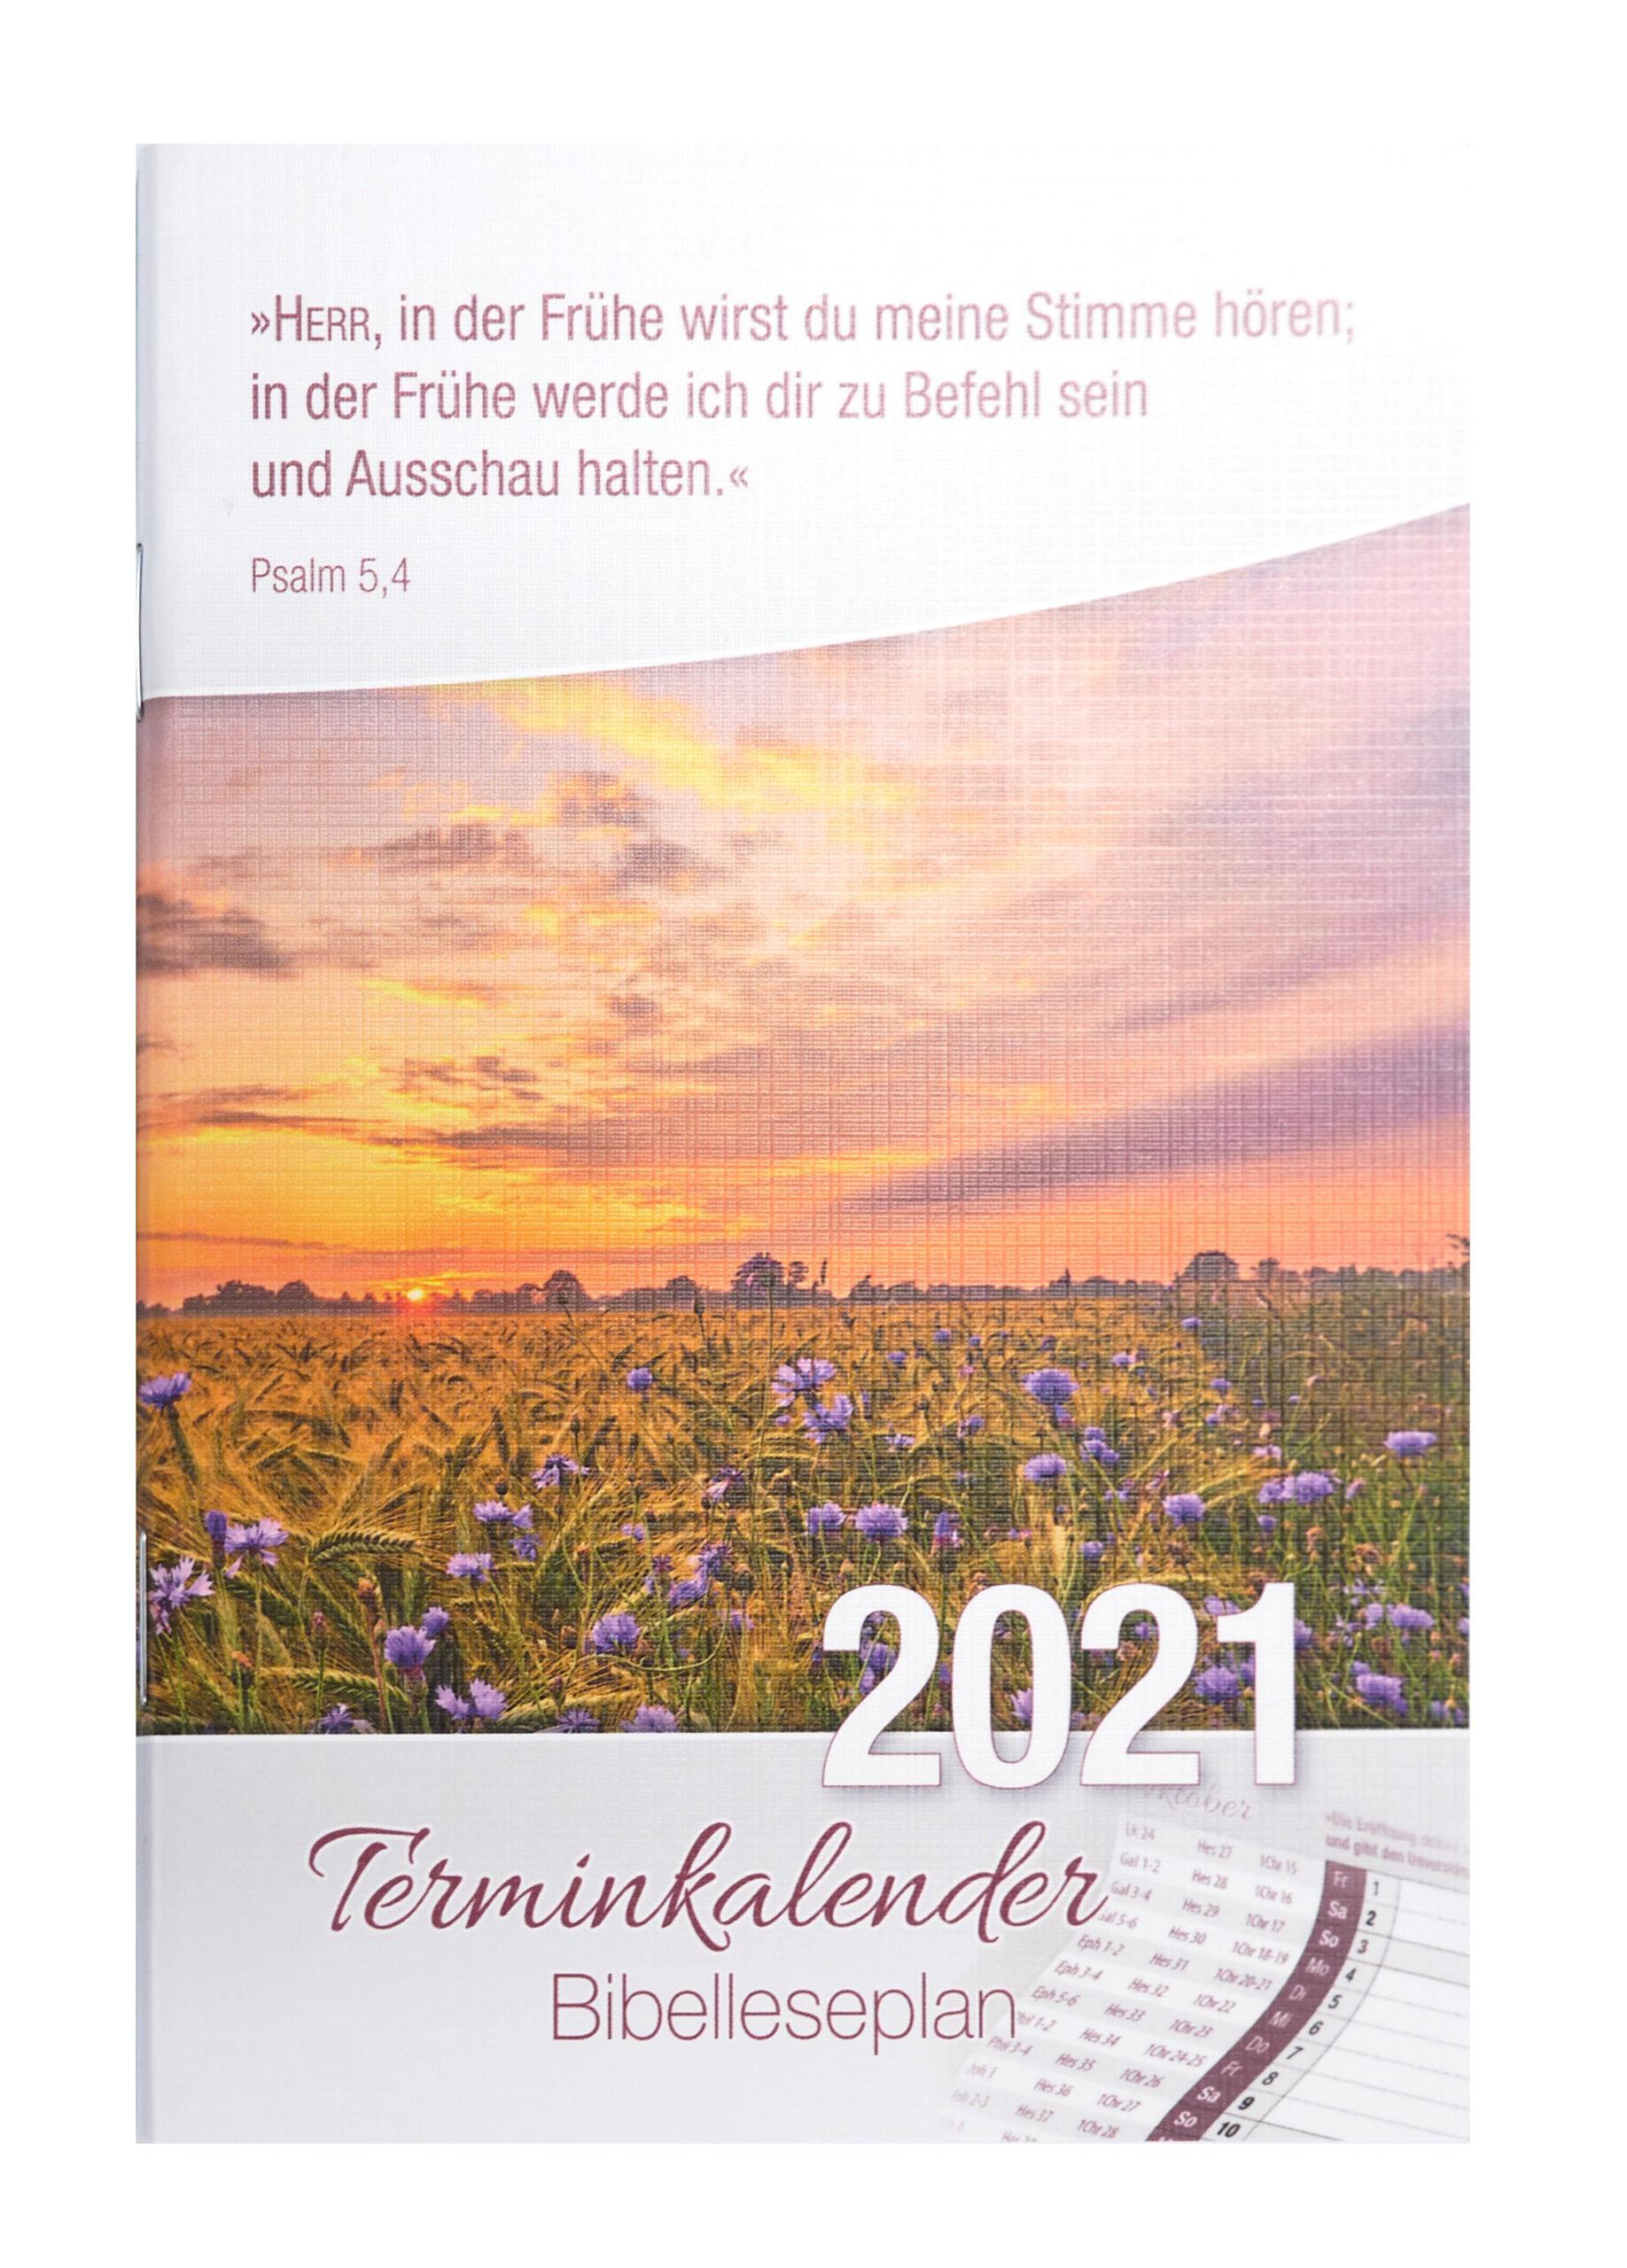 Bibelleseplan 2021